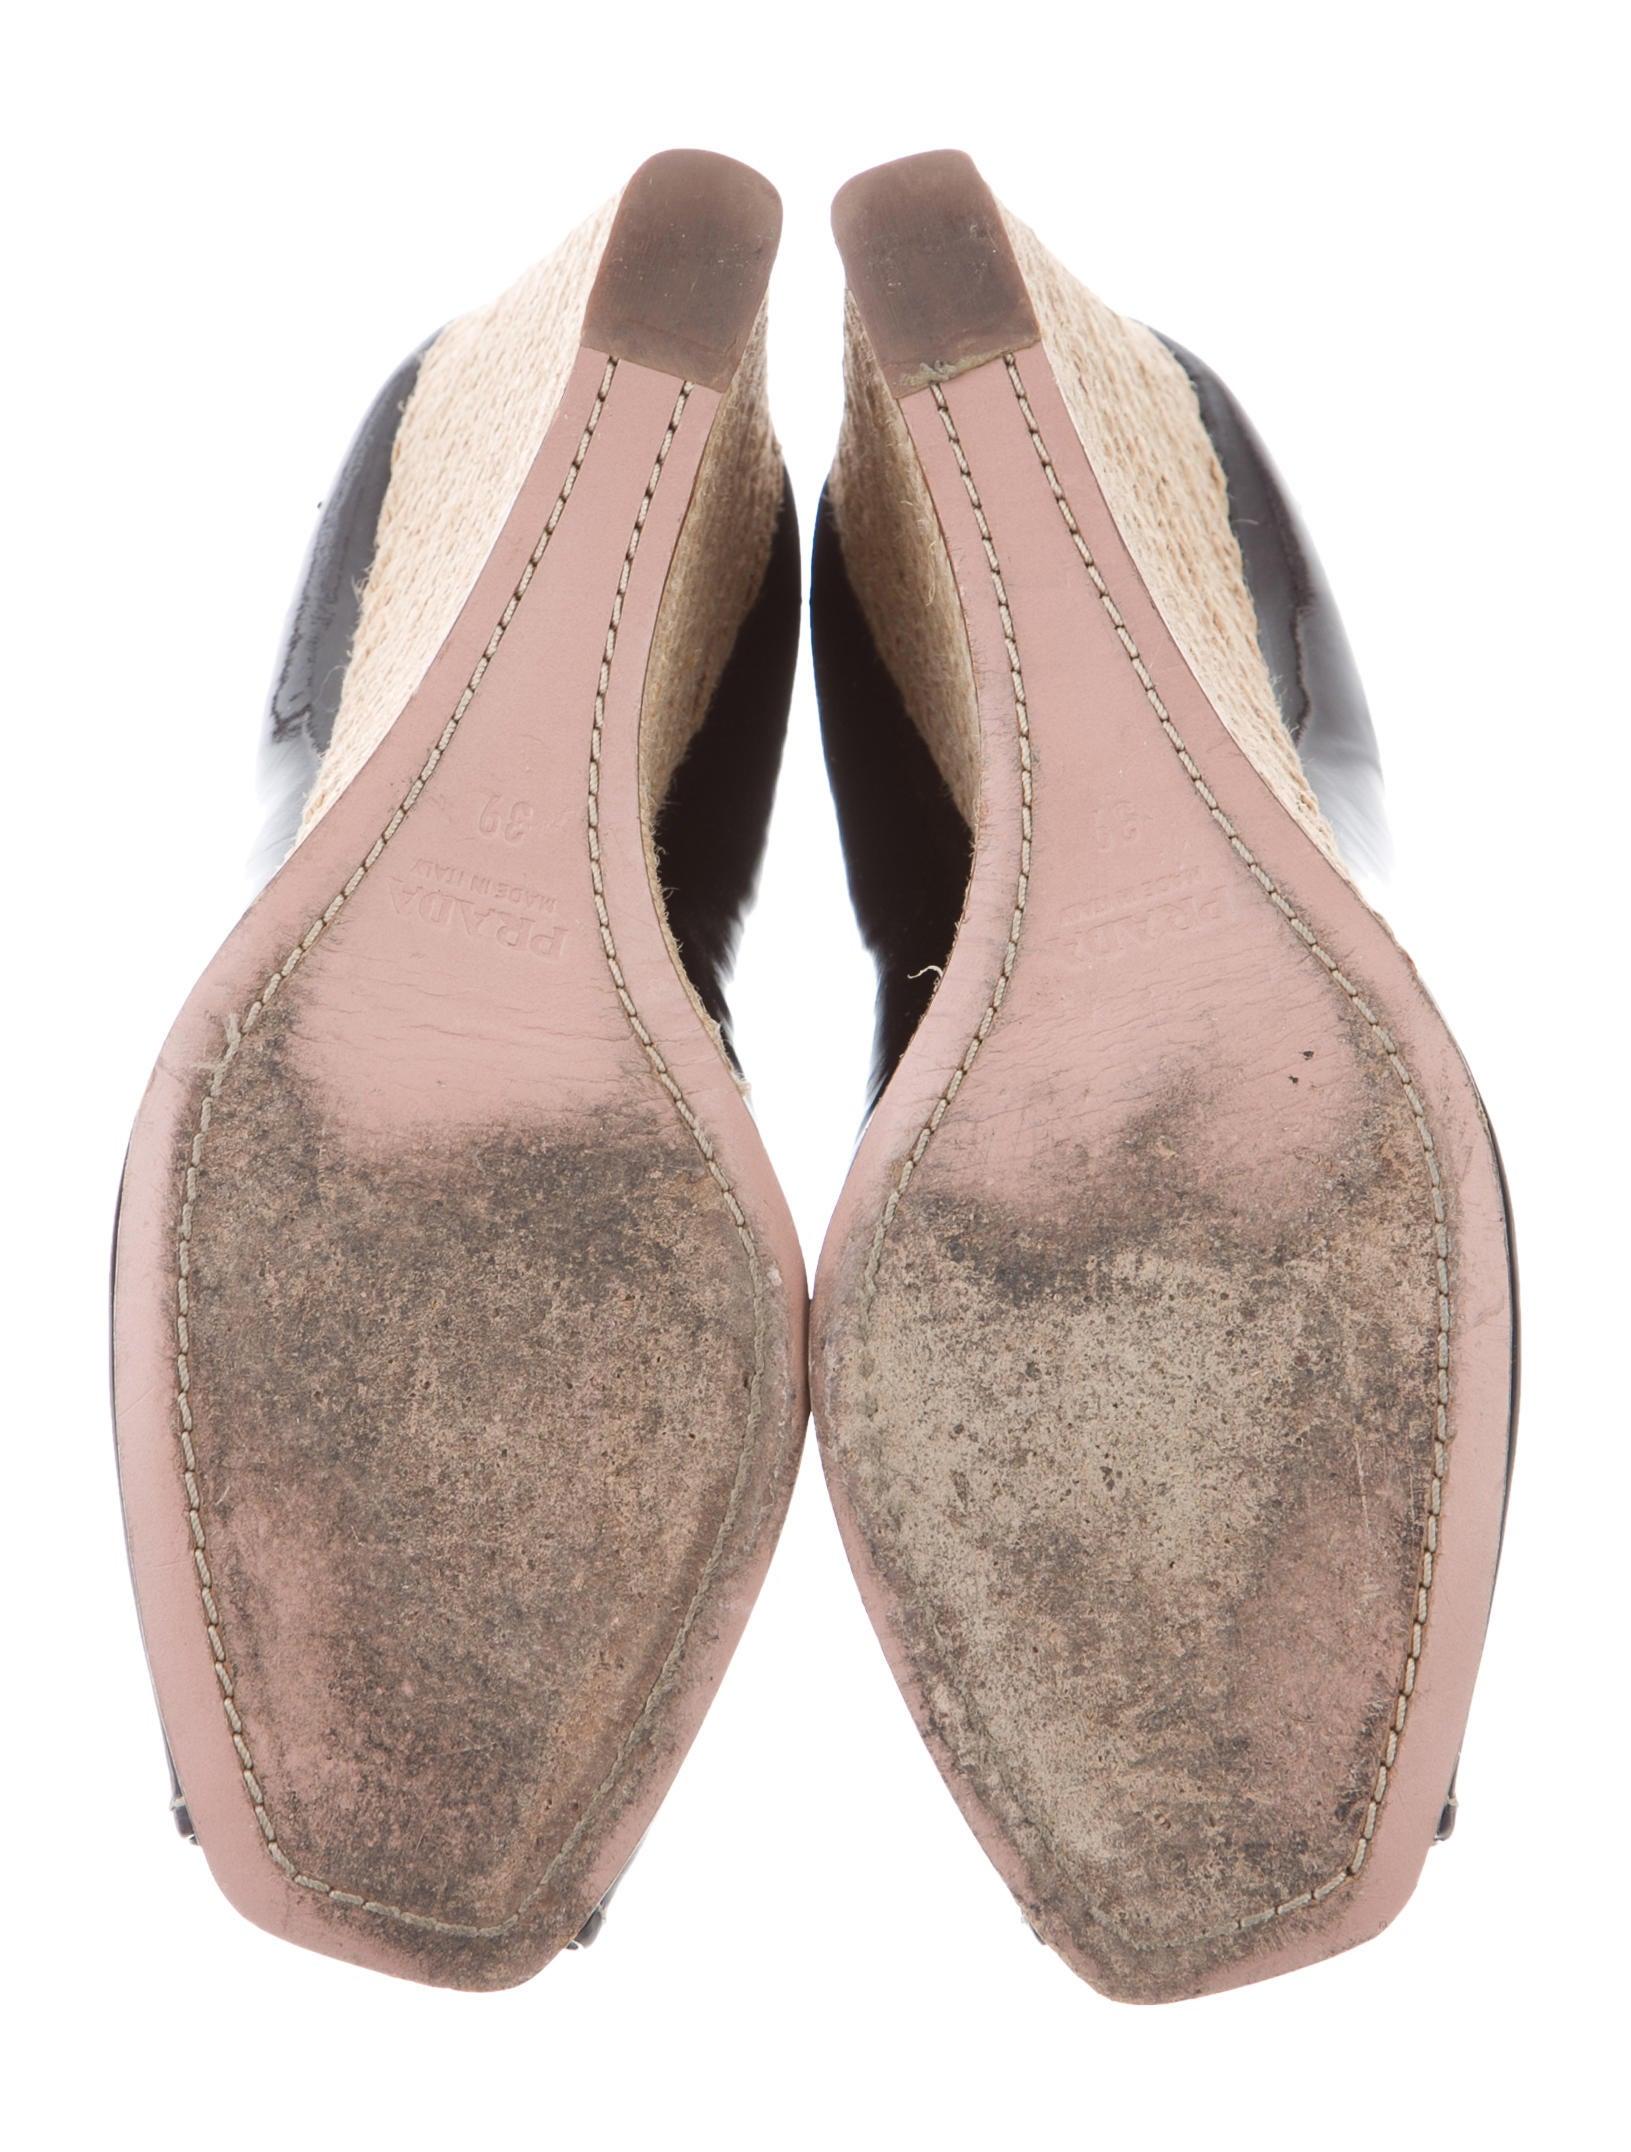 prada peep toe espadrille wedges shoes pra140273 the